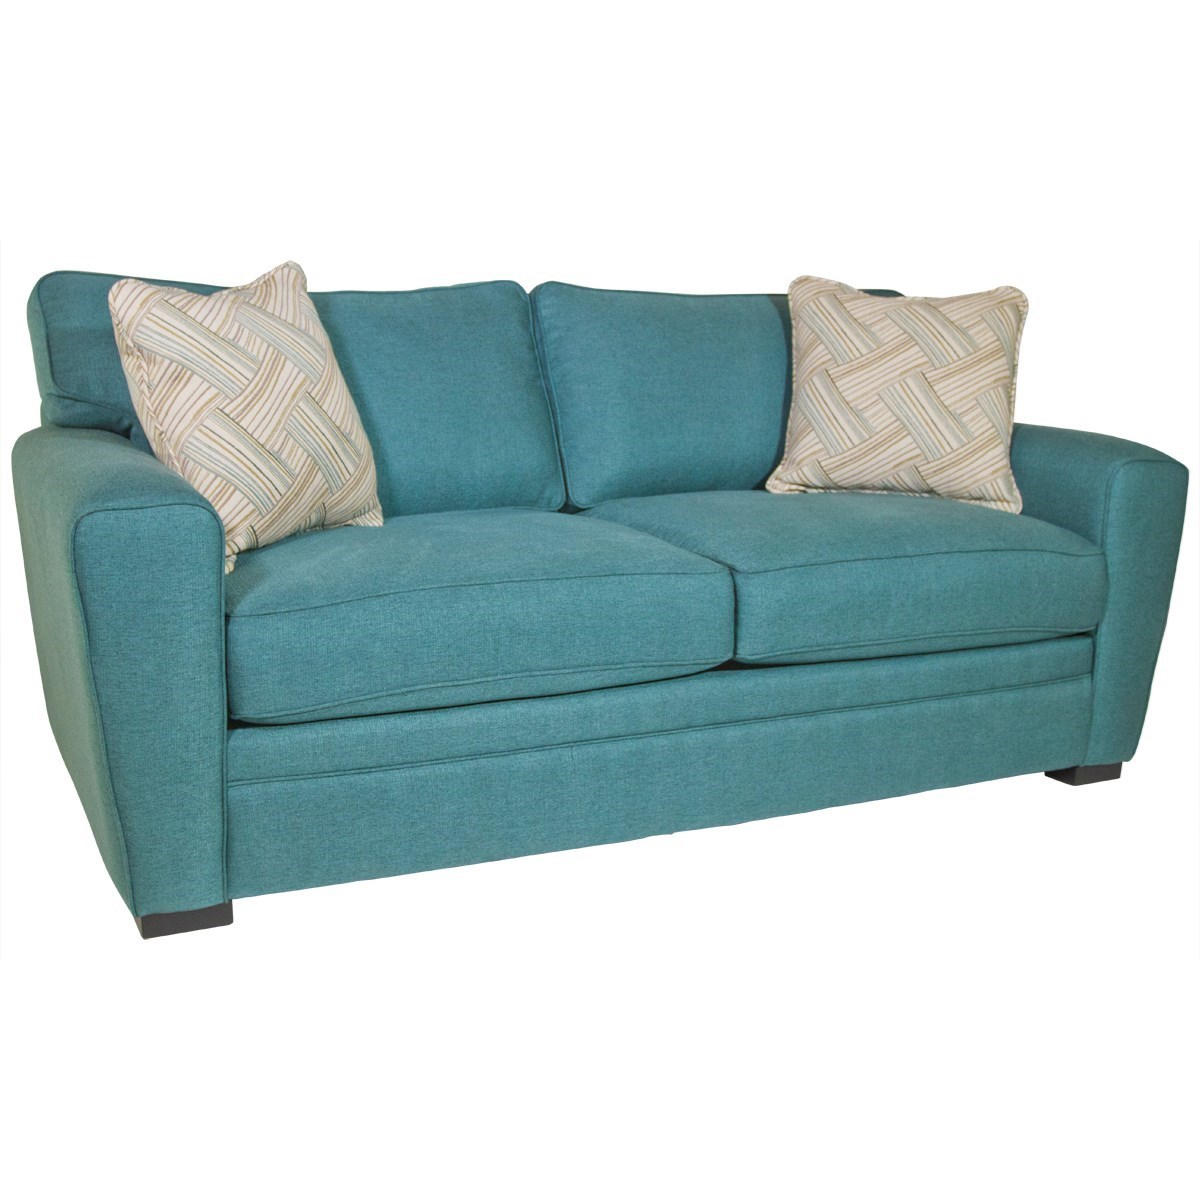 Jonathan Louis Choices Artemis Contemporary Full Sofa